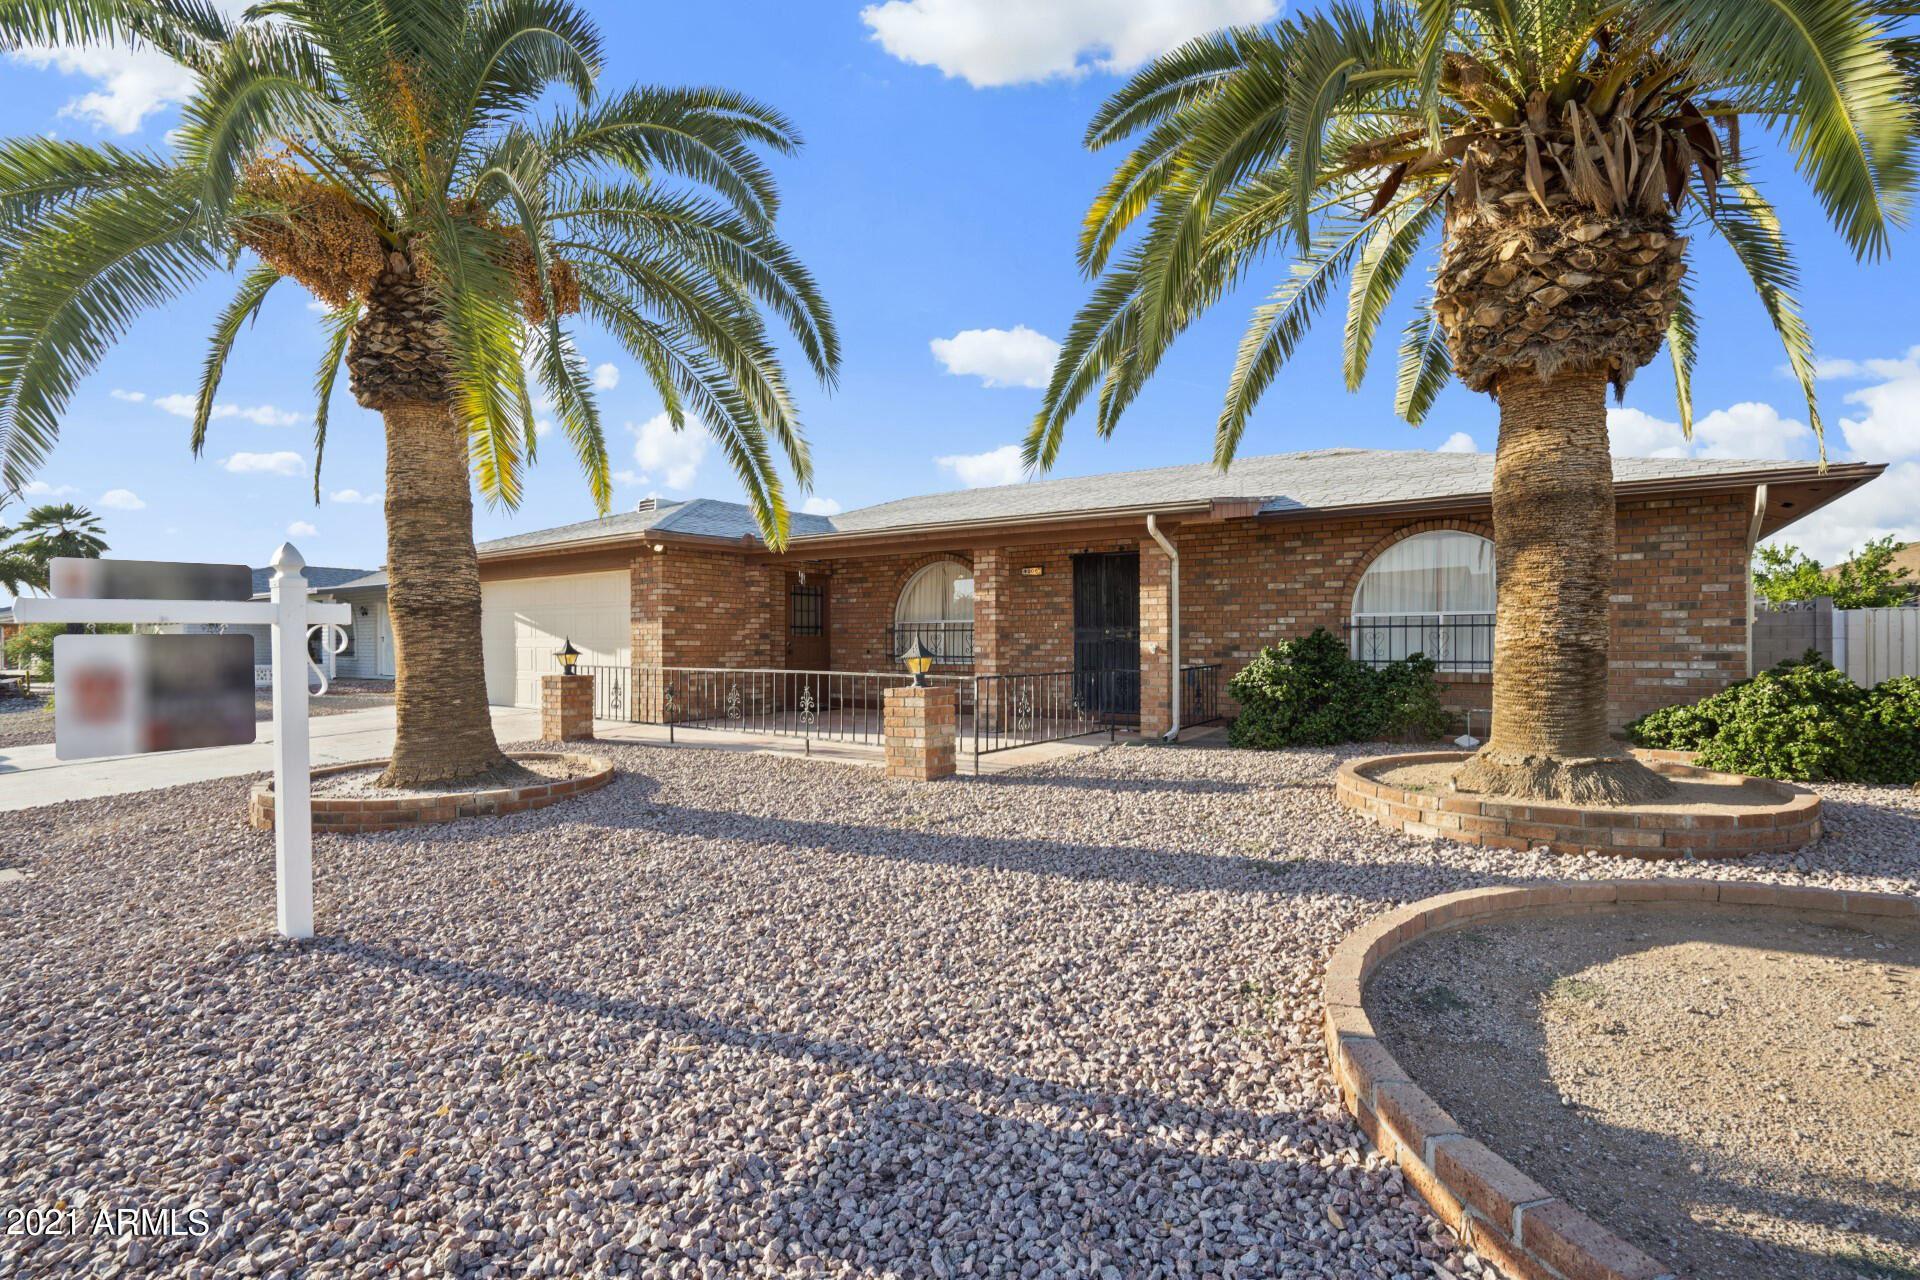 4206 E CAPRI Avenue, Mesa, AZ 85206 - MLS#: 6283312